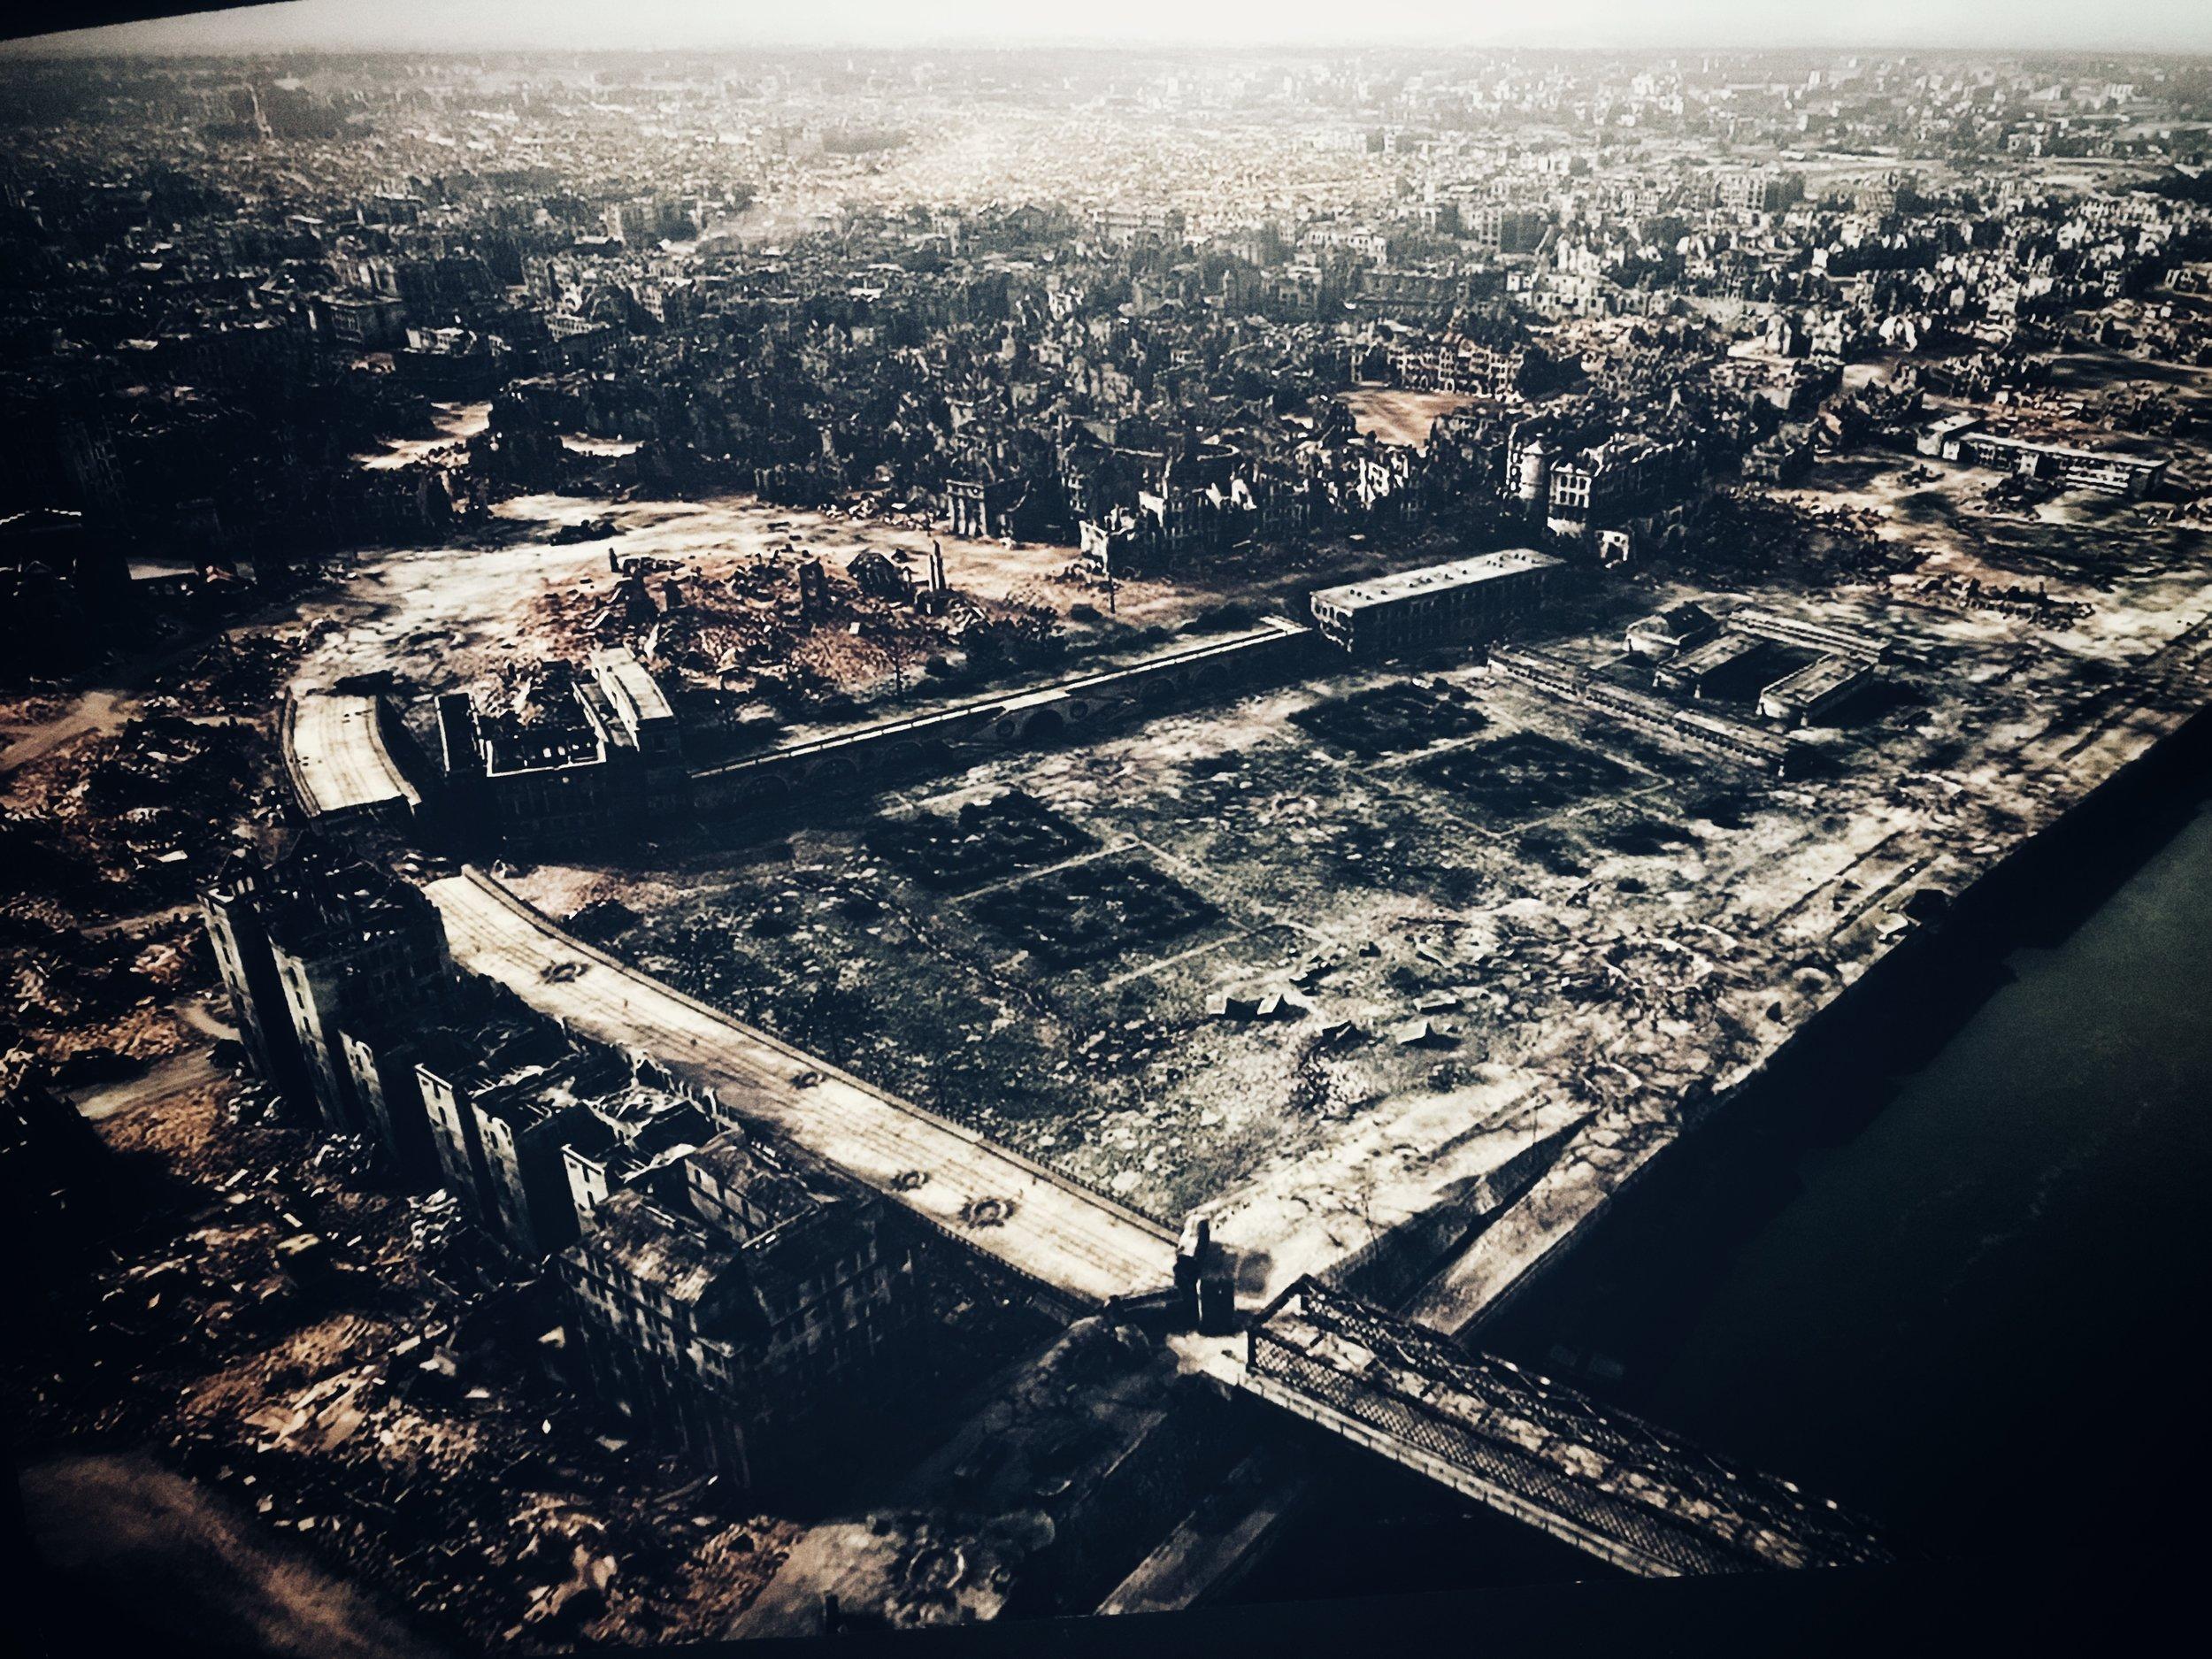 warsaw uprising museum photo of war destruction